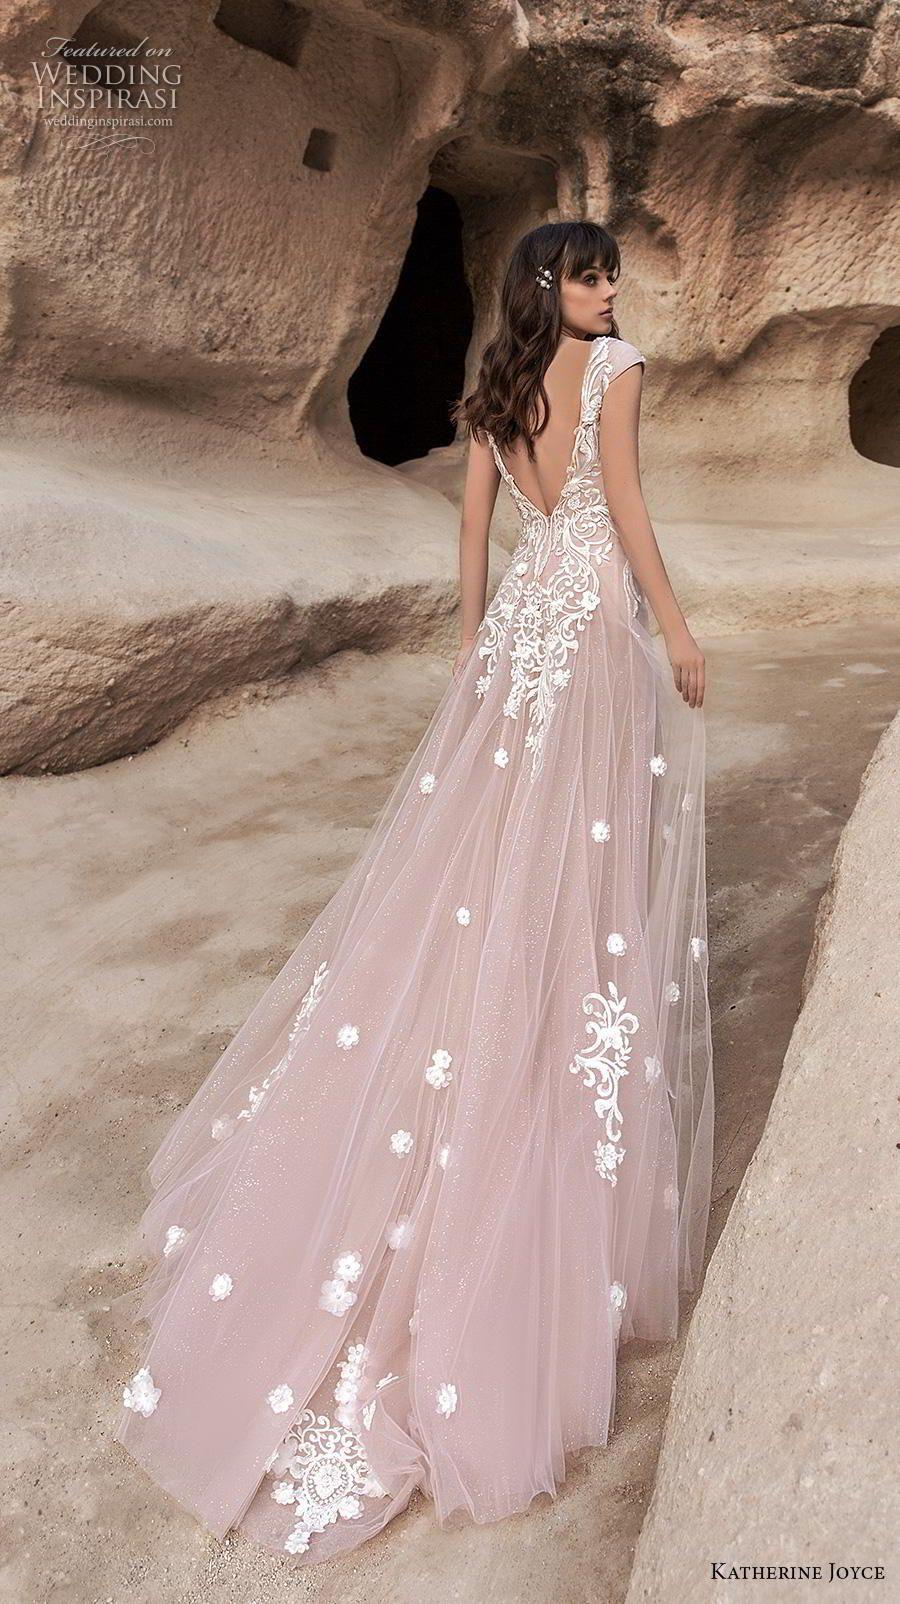 Katherine Joyce 2020 Wedding Dresses Wind Desert Bridal Collection Wedding Inspirasi Wedding Dresses Blush Pink Wedding Dresses Backless Wedding Dress